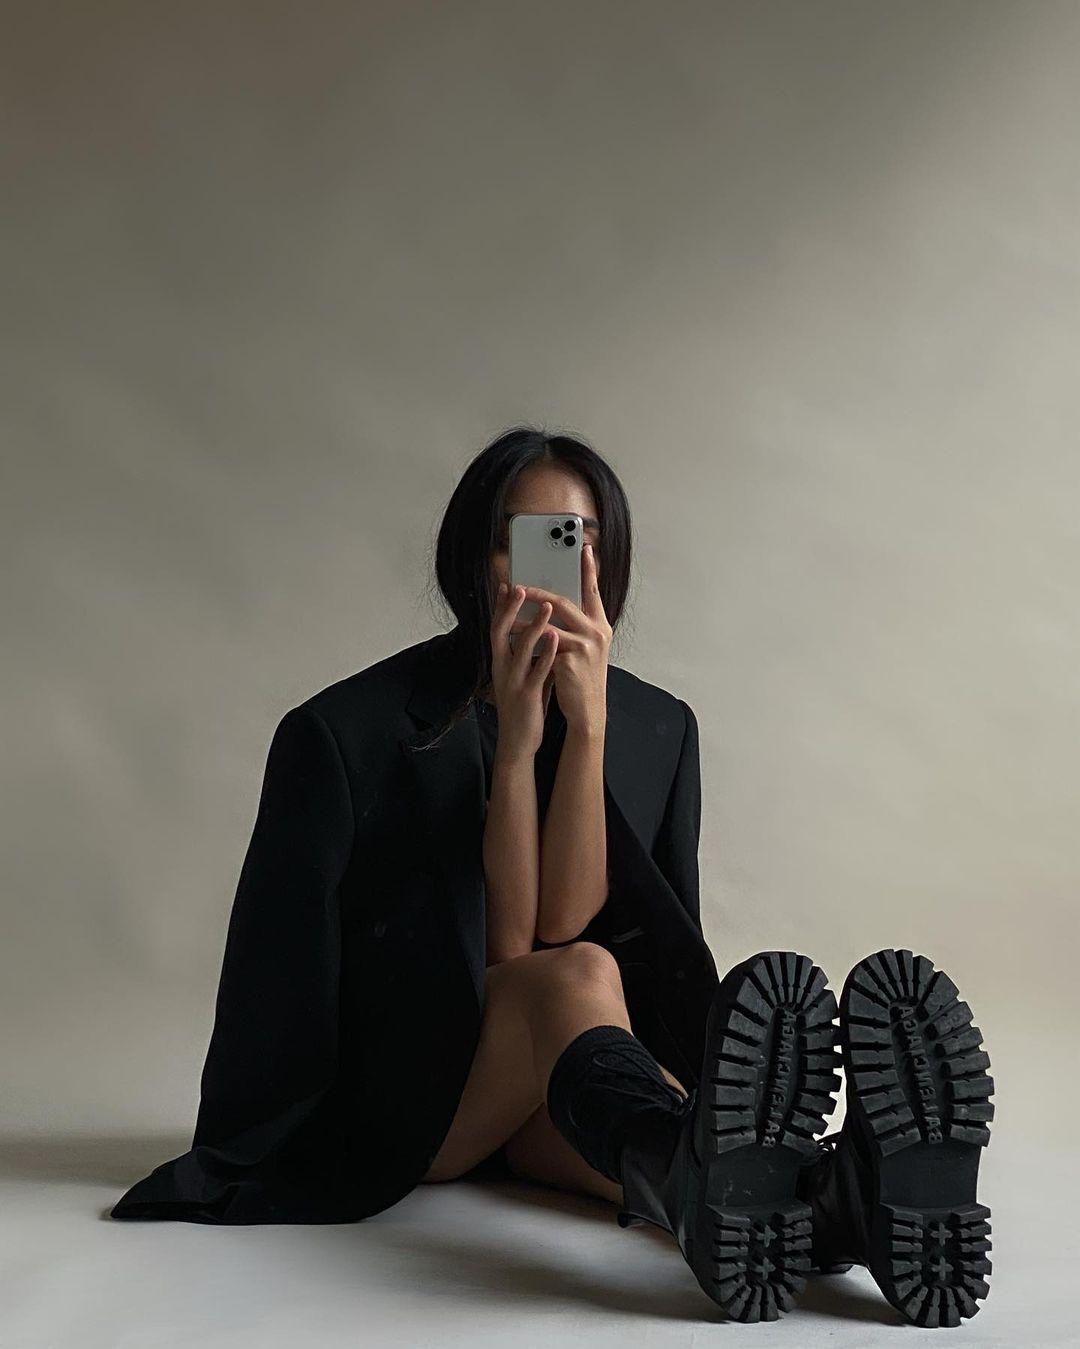 ida anduyan ootd poses